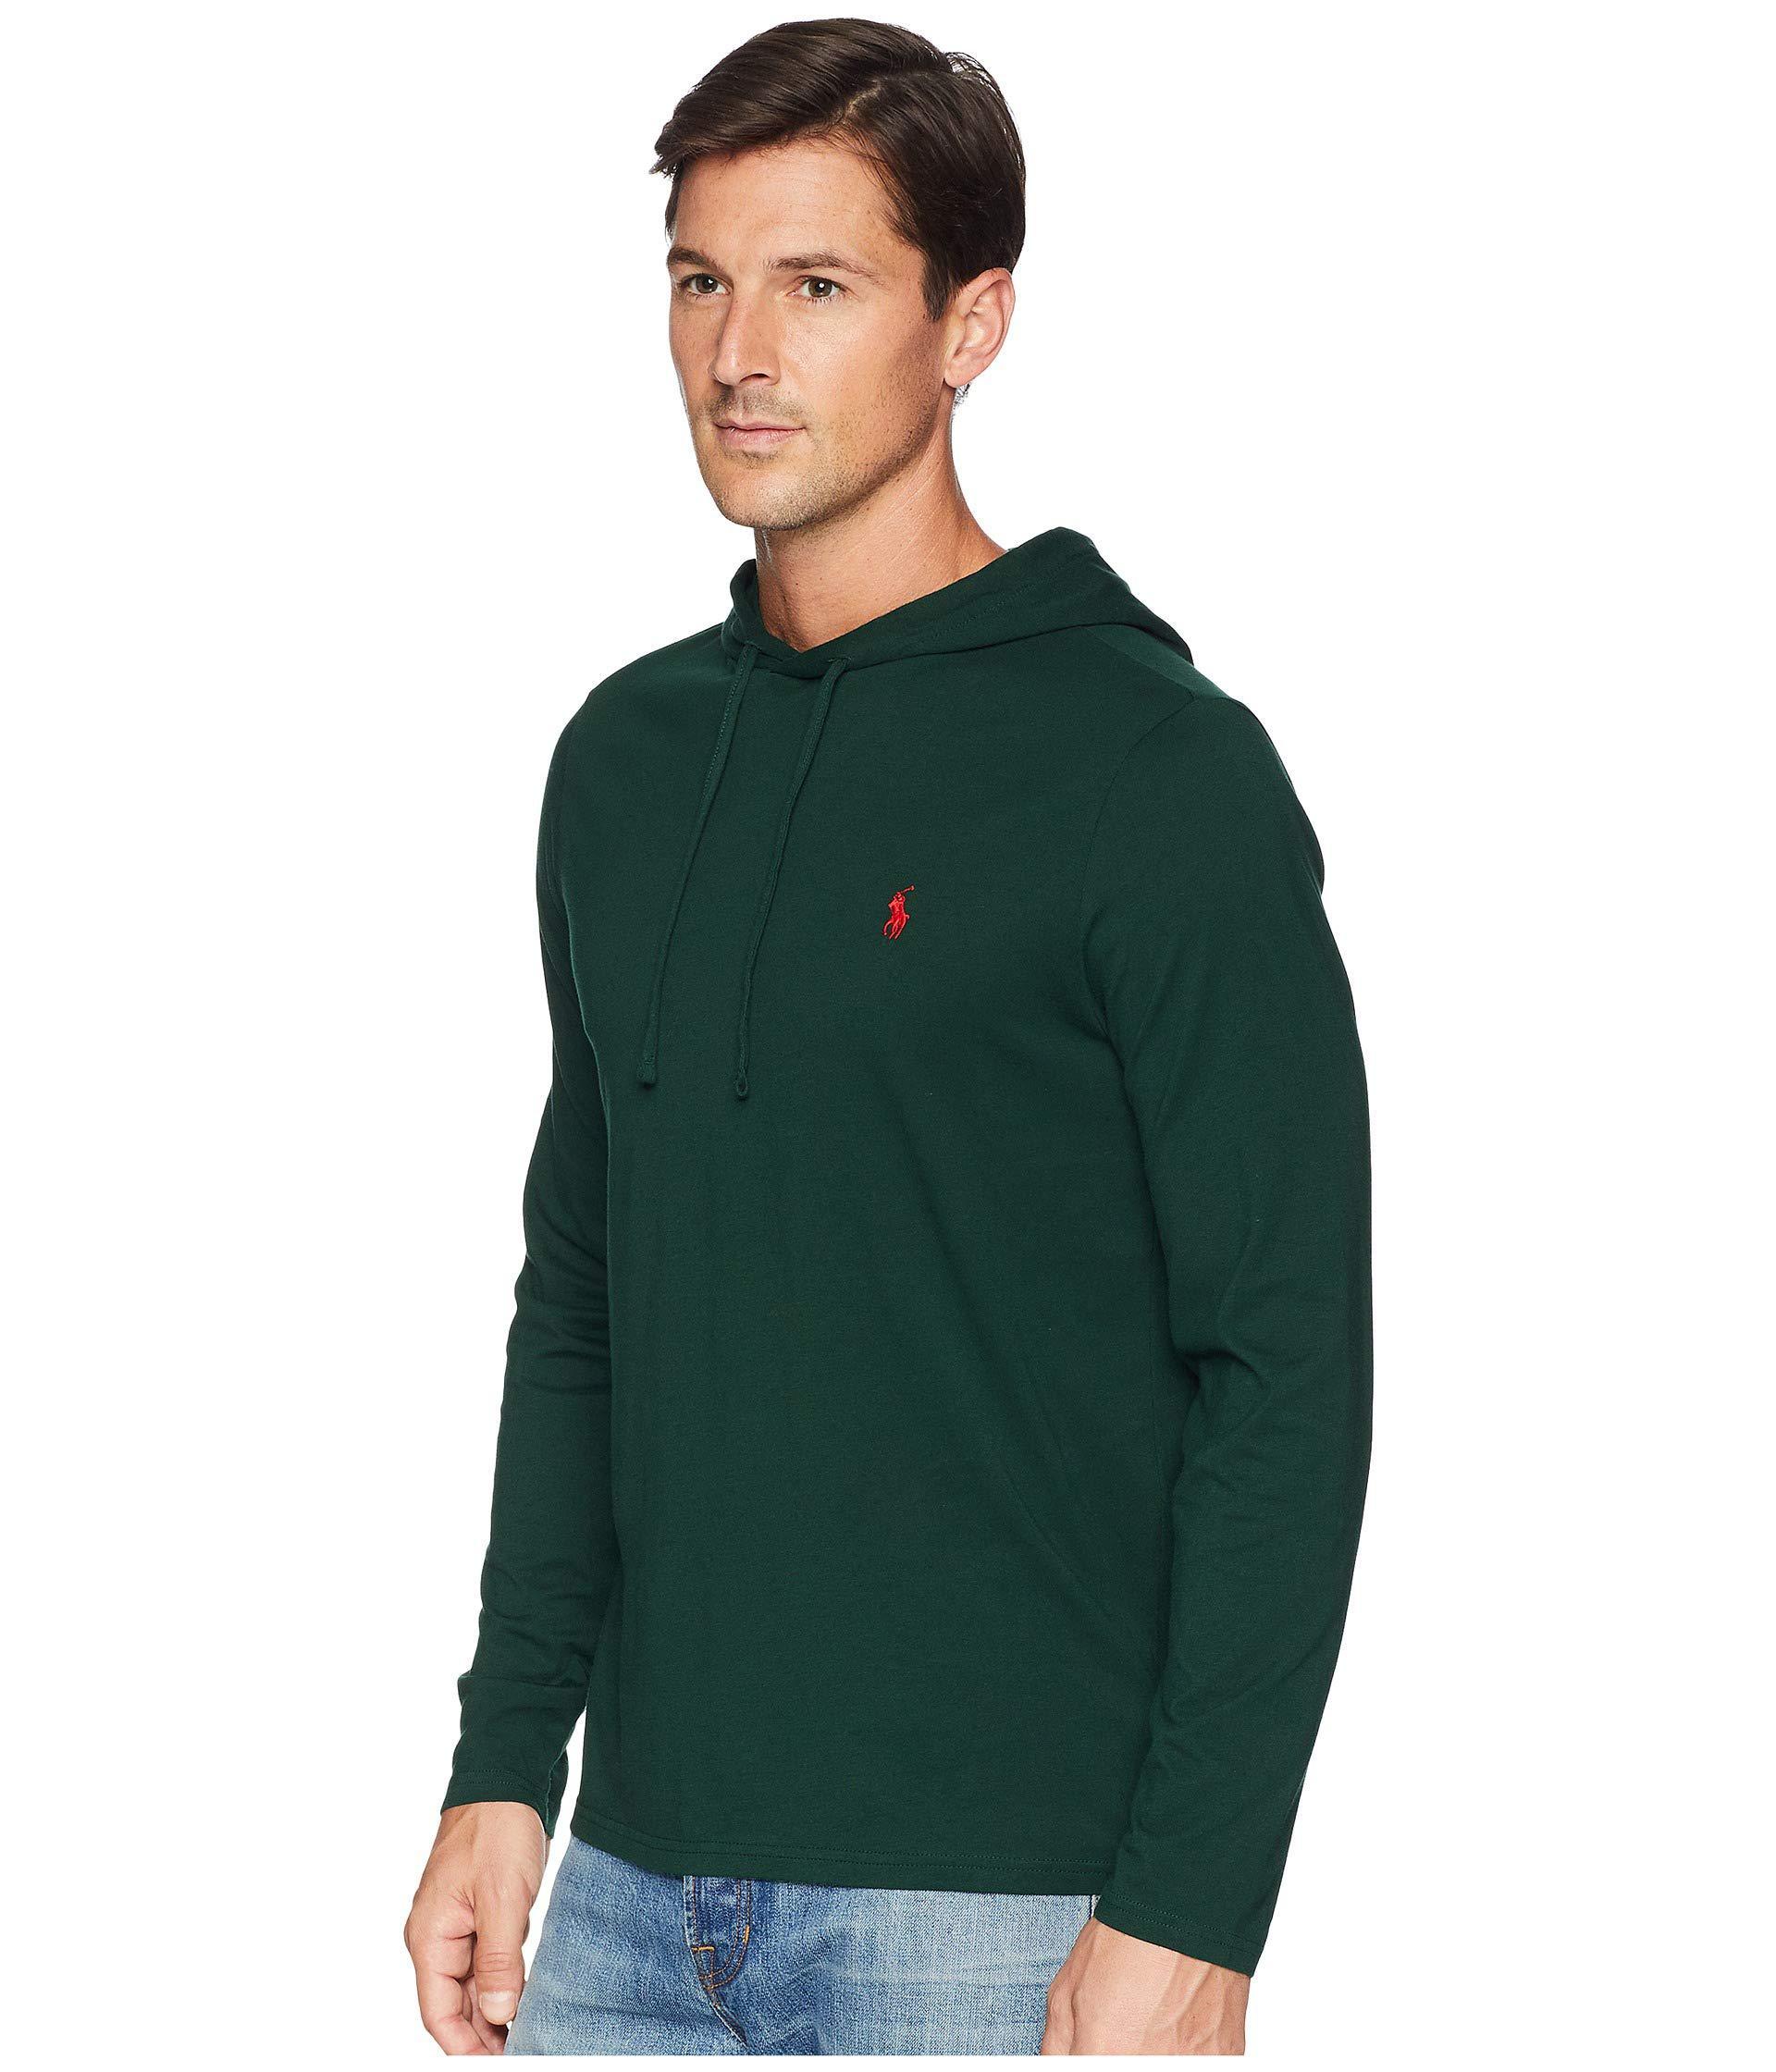 283bae3f4974 Lyst - Polo Ralph Lauren 30 1 Jersey Long Sleeve Hooded T-shirt (college  Green) Men s T Shirt in Green for Men